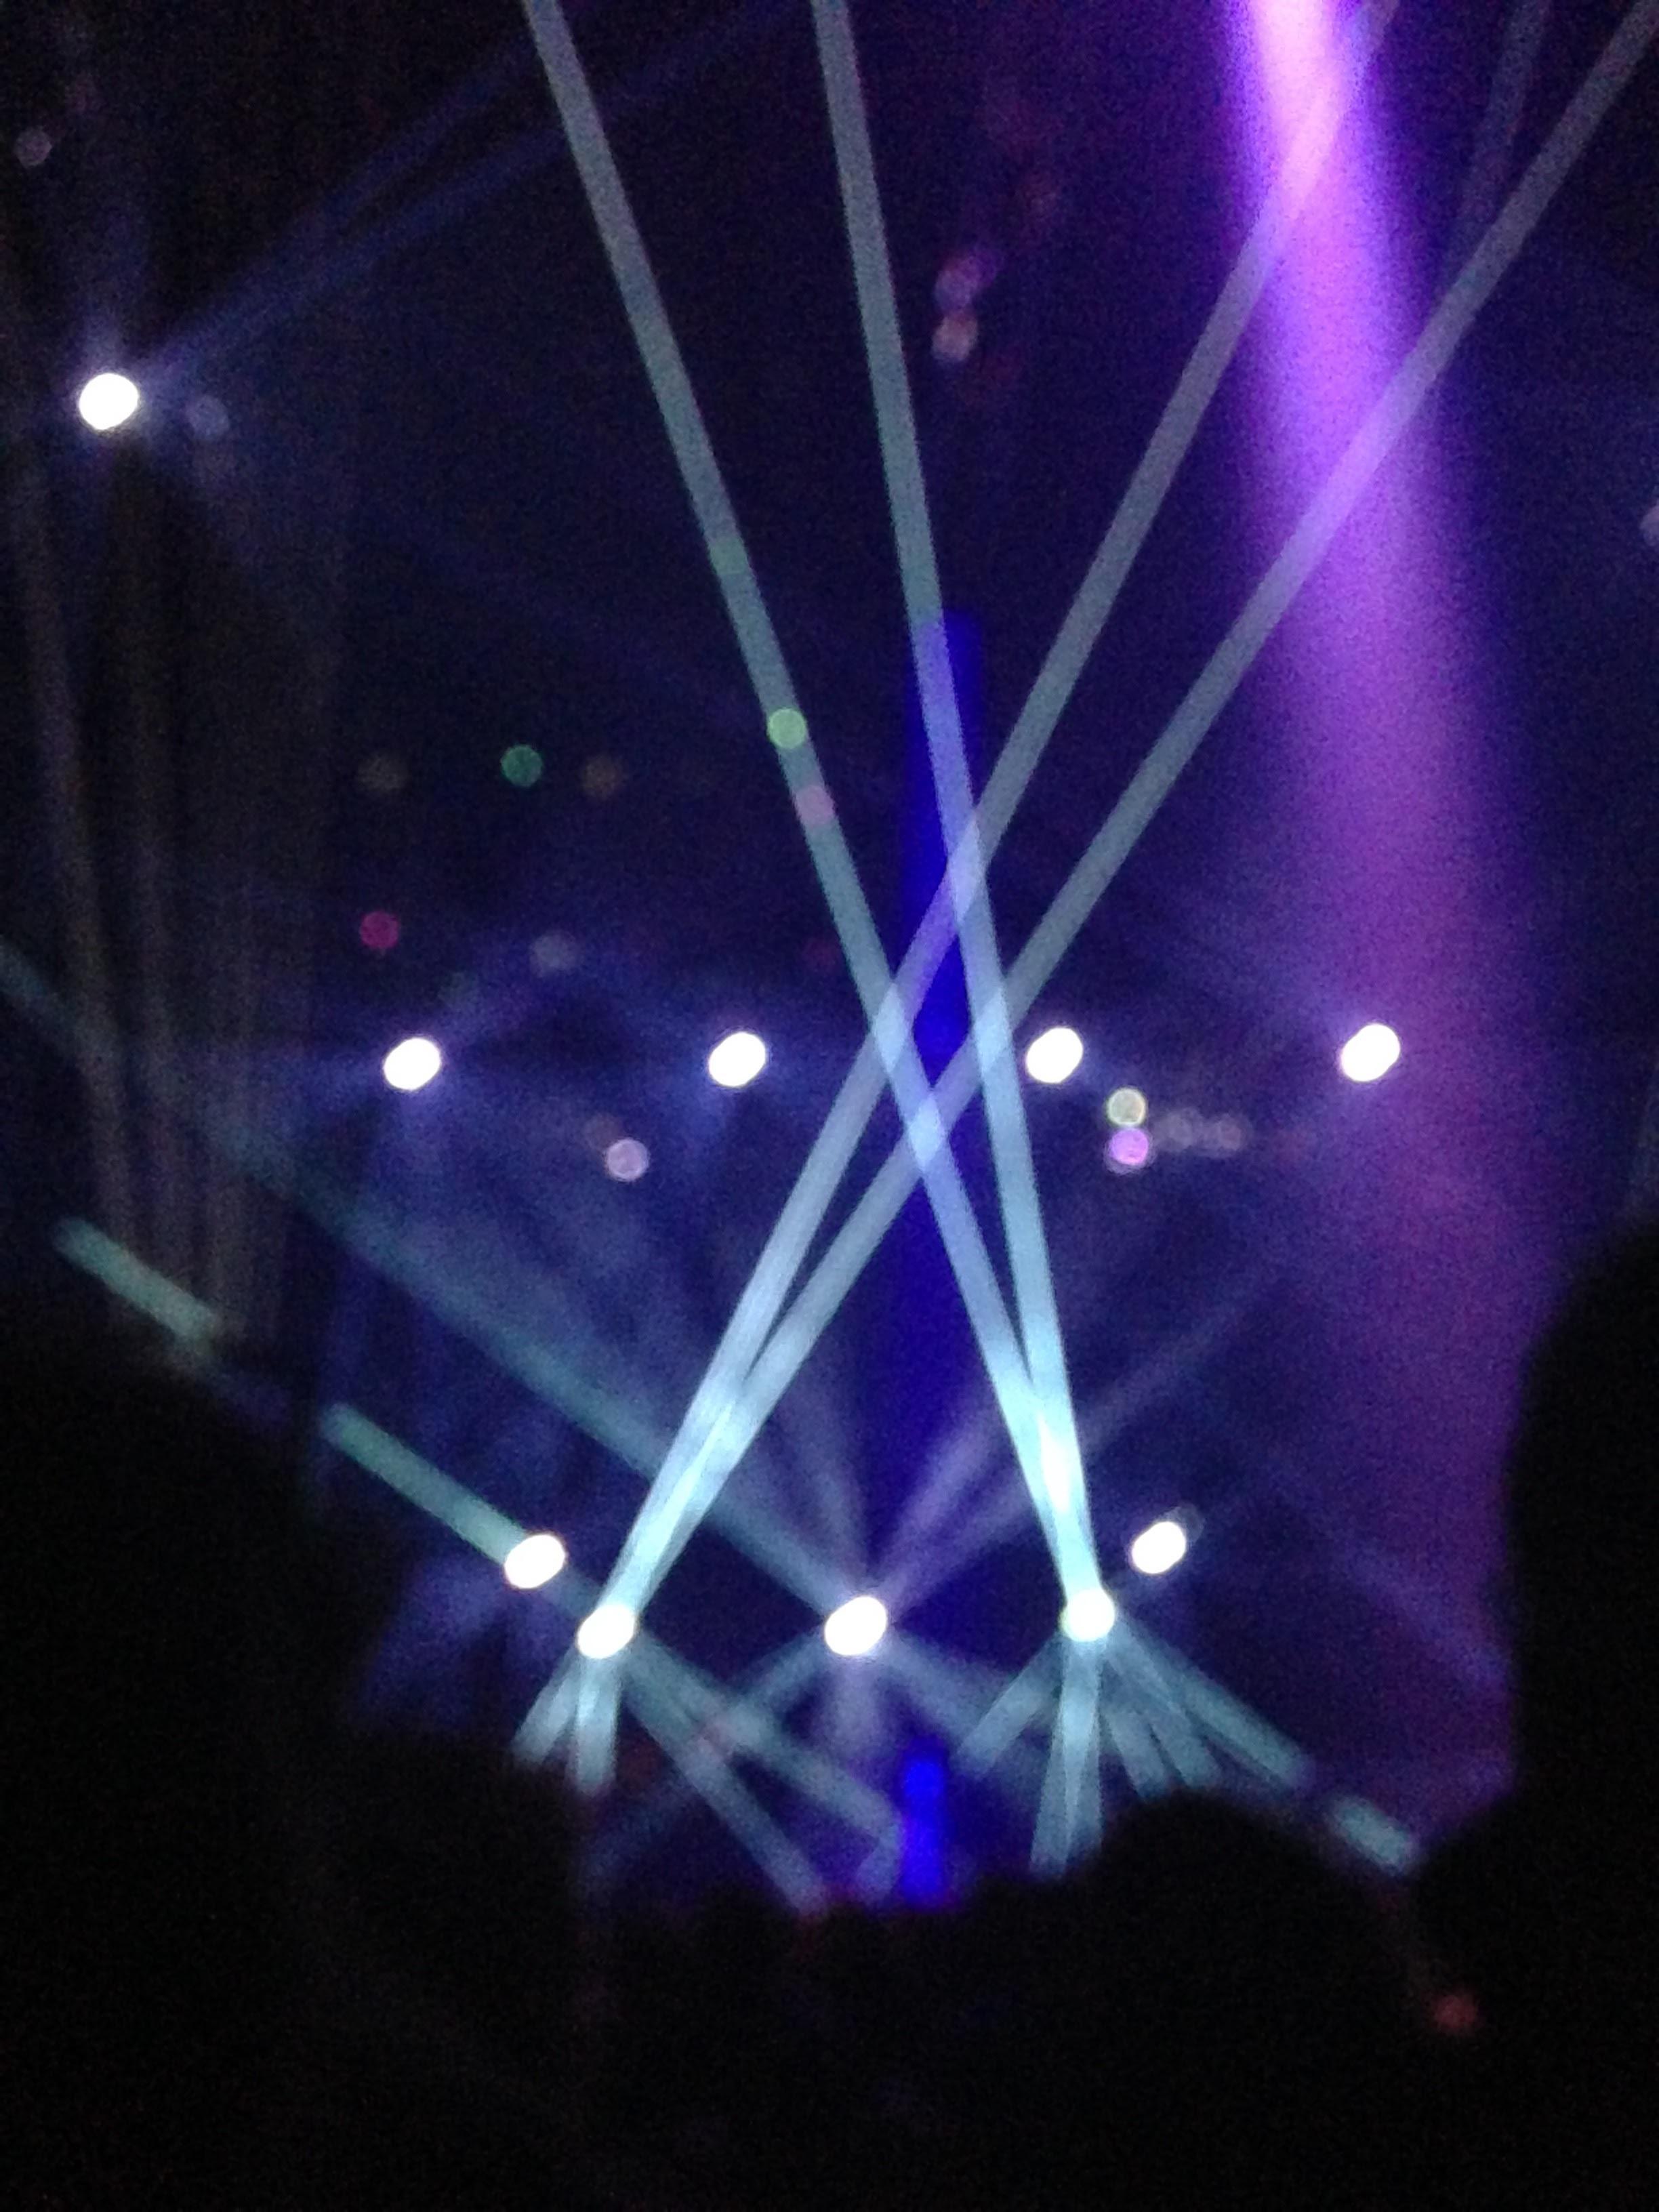 Trans-Siberian-Orchestra-Blurred-Lights.jpg